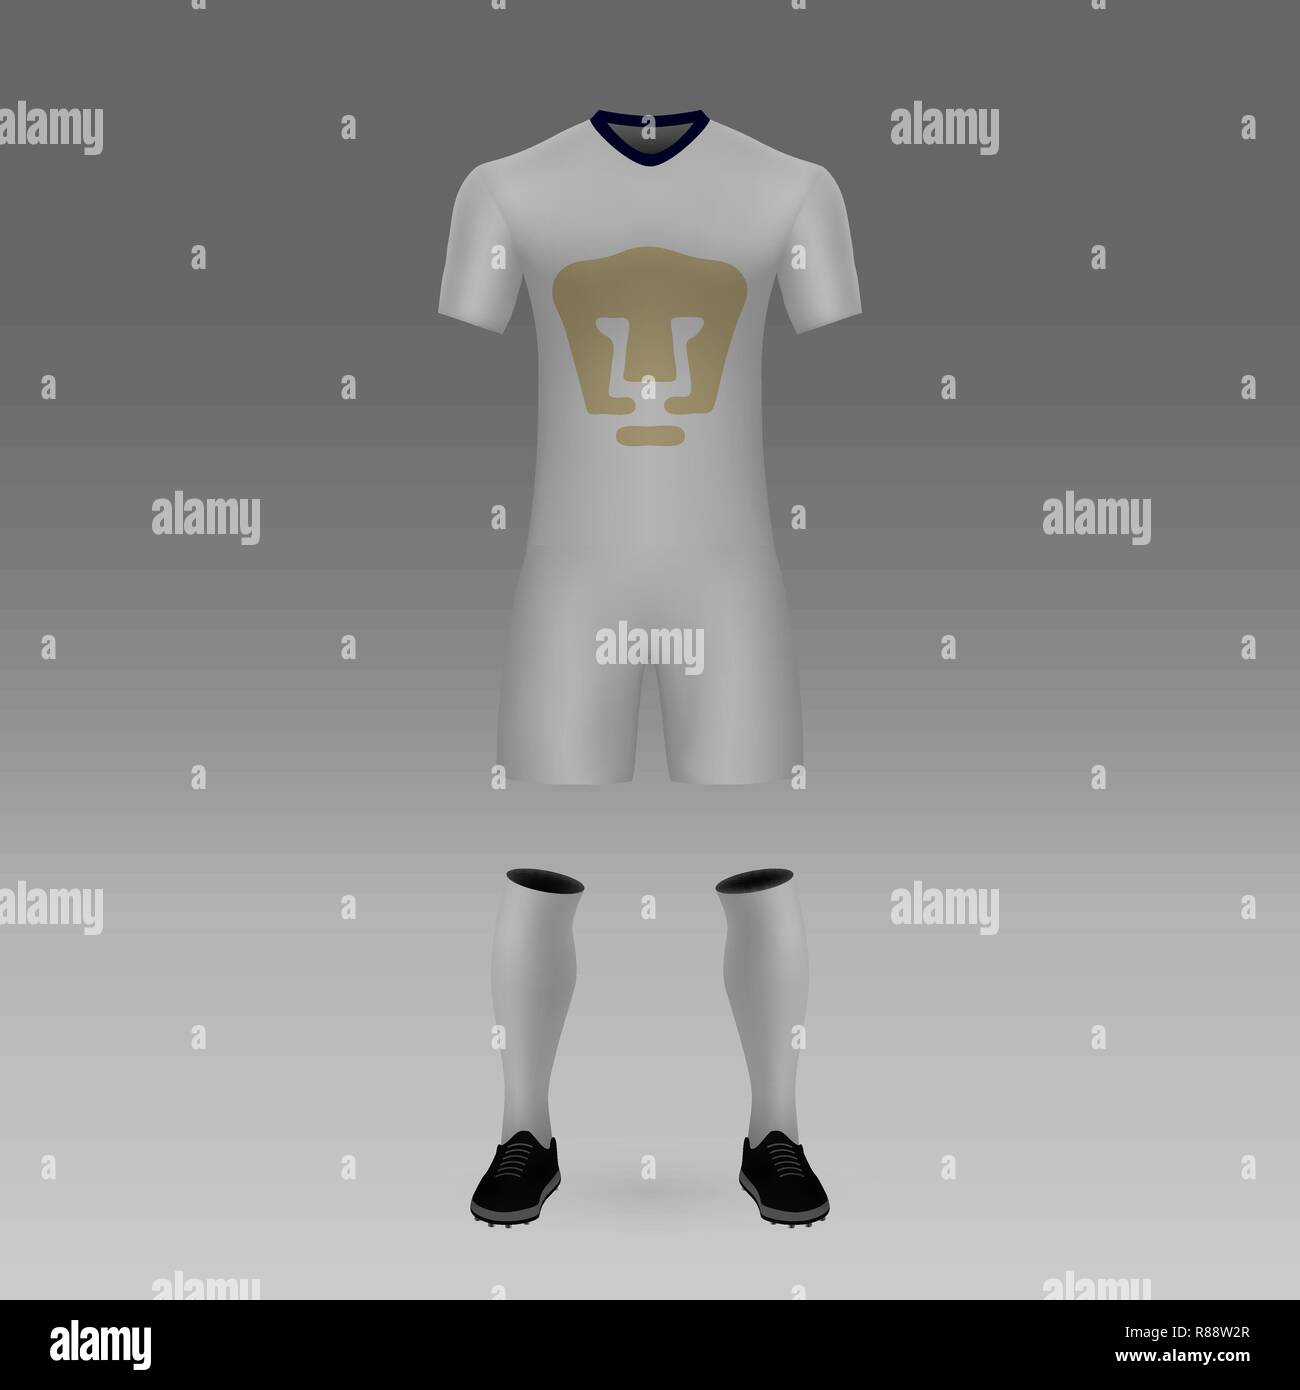 football kit unam pumas shirt template for soccer jersey vector